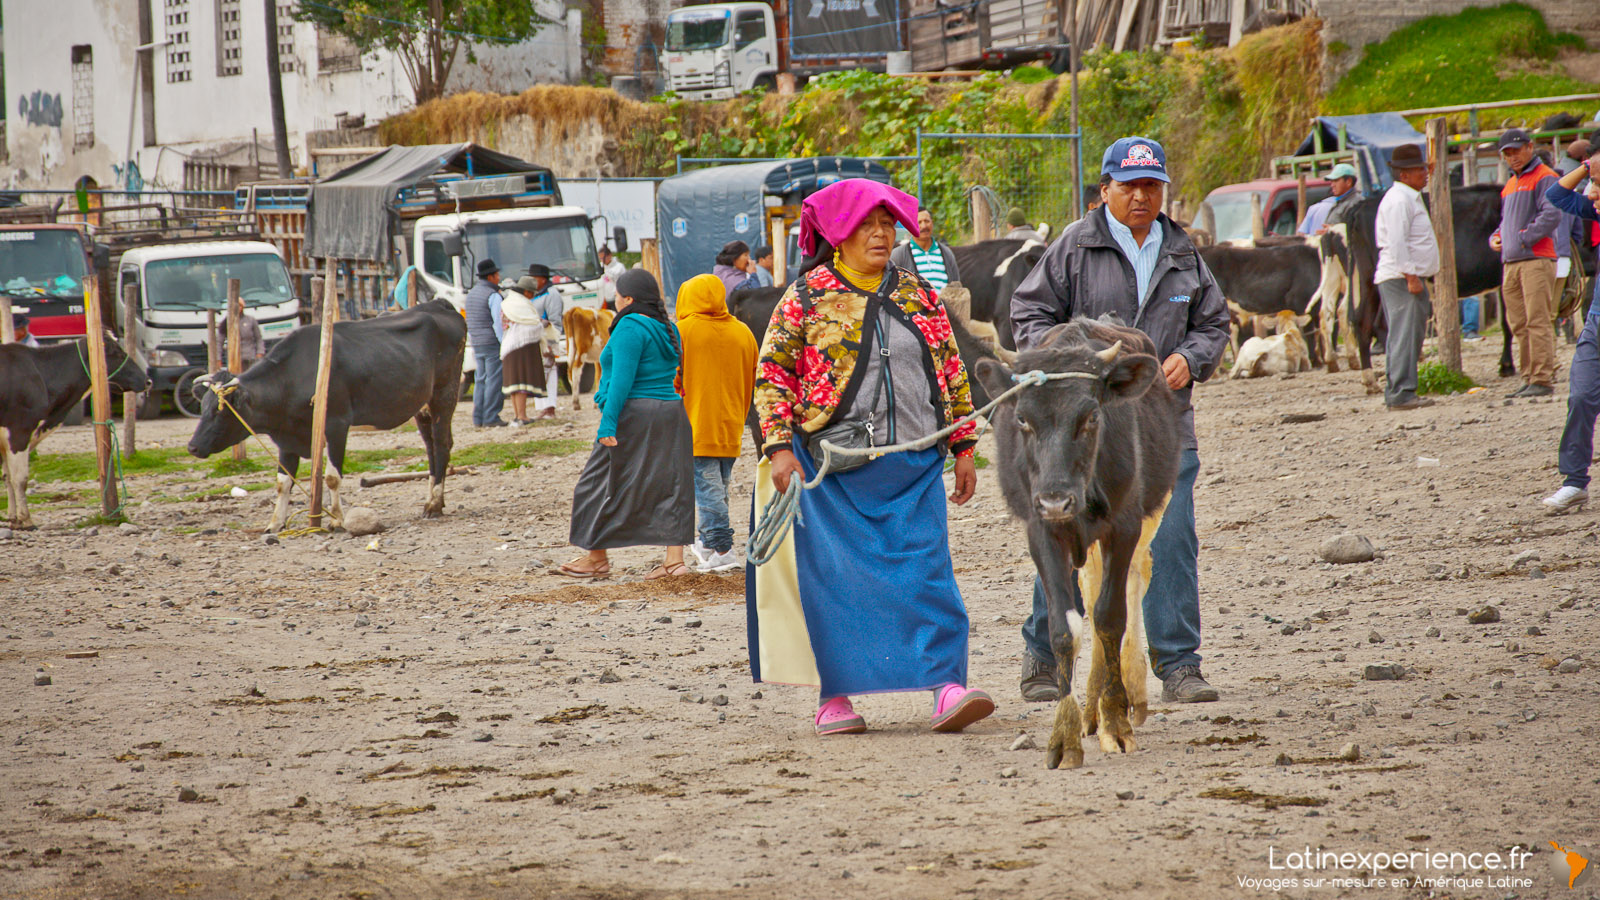 Equateur - Otavalo - Woman - Latinexperience voyages